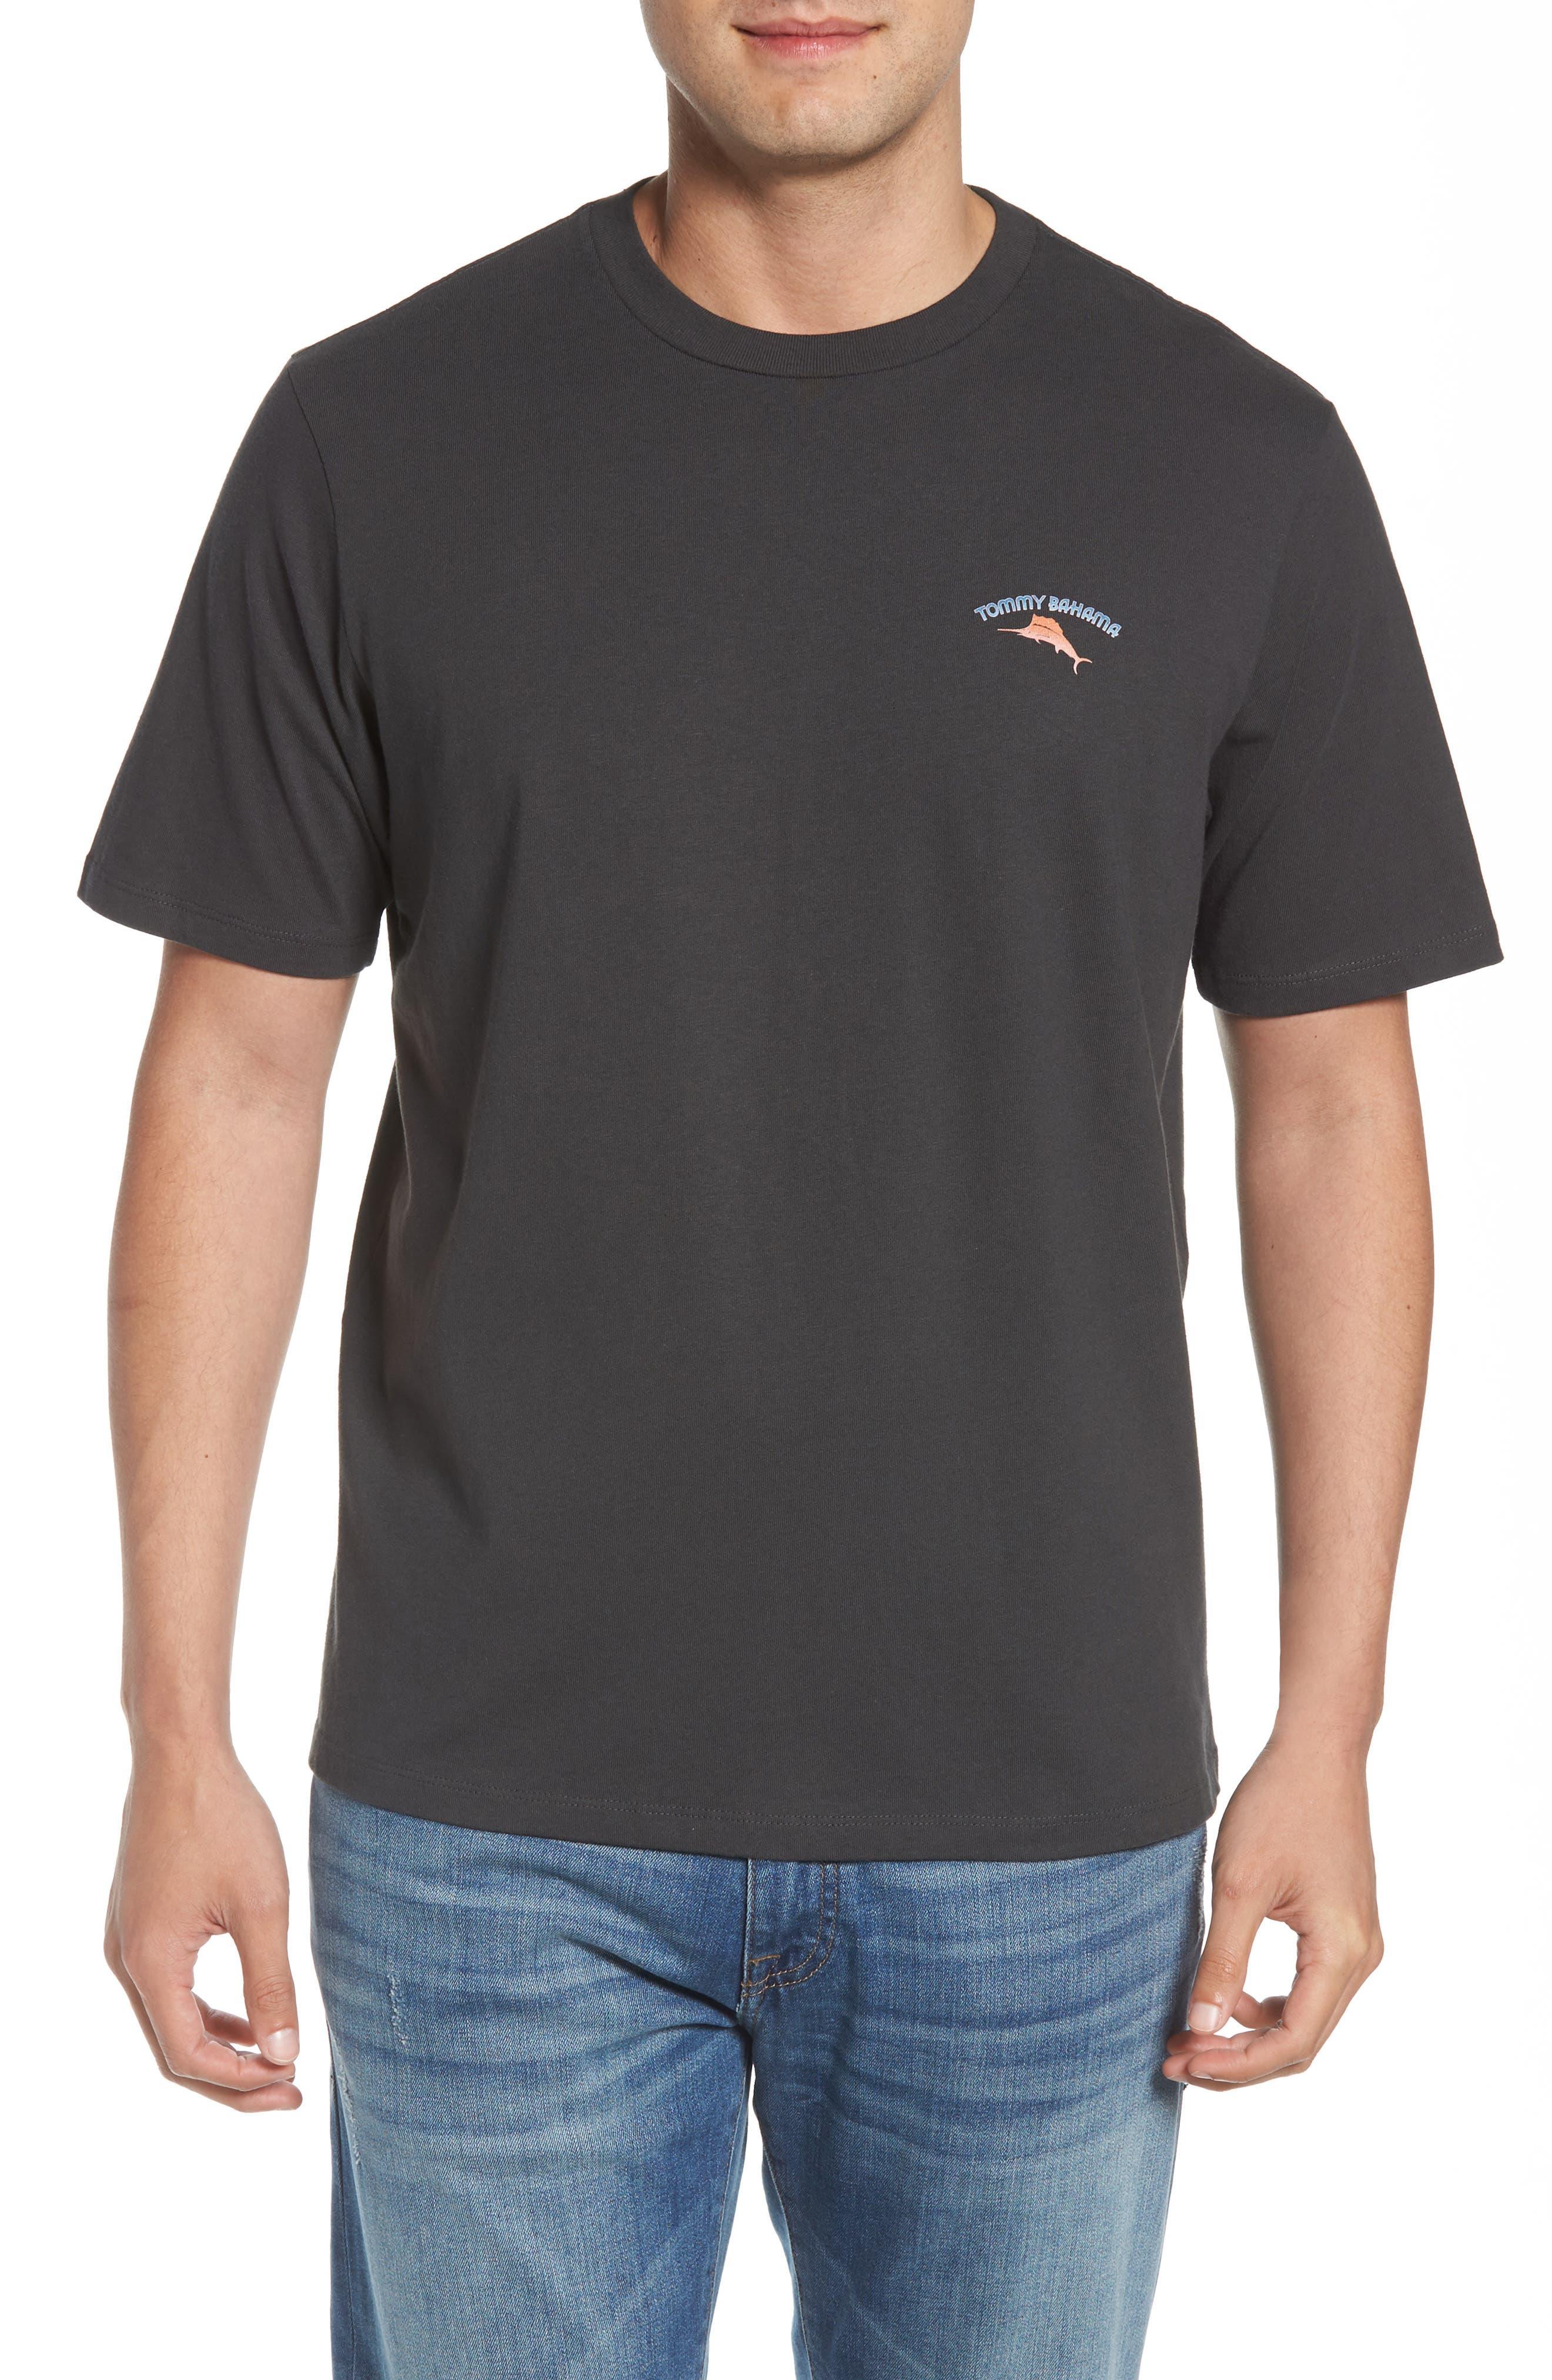 Bromingos T-Shirt,                             Main thumbnail 1, color,